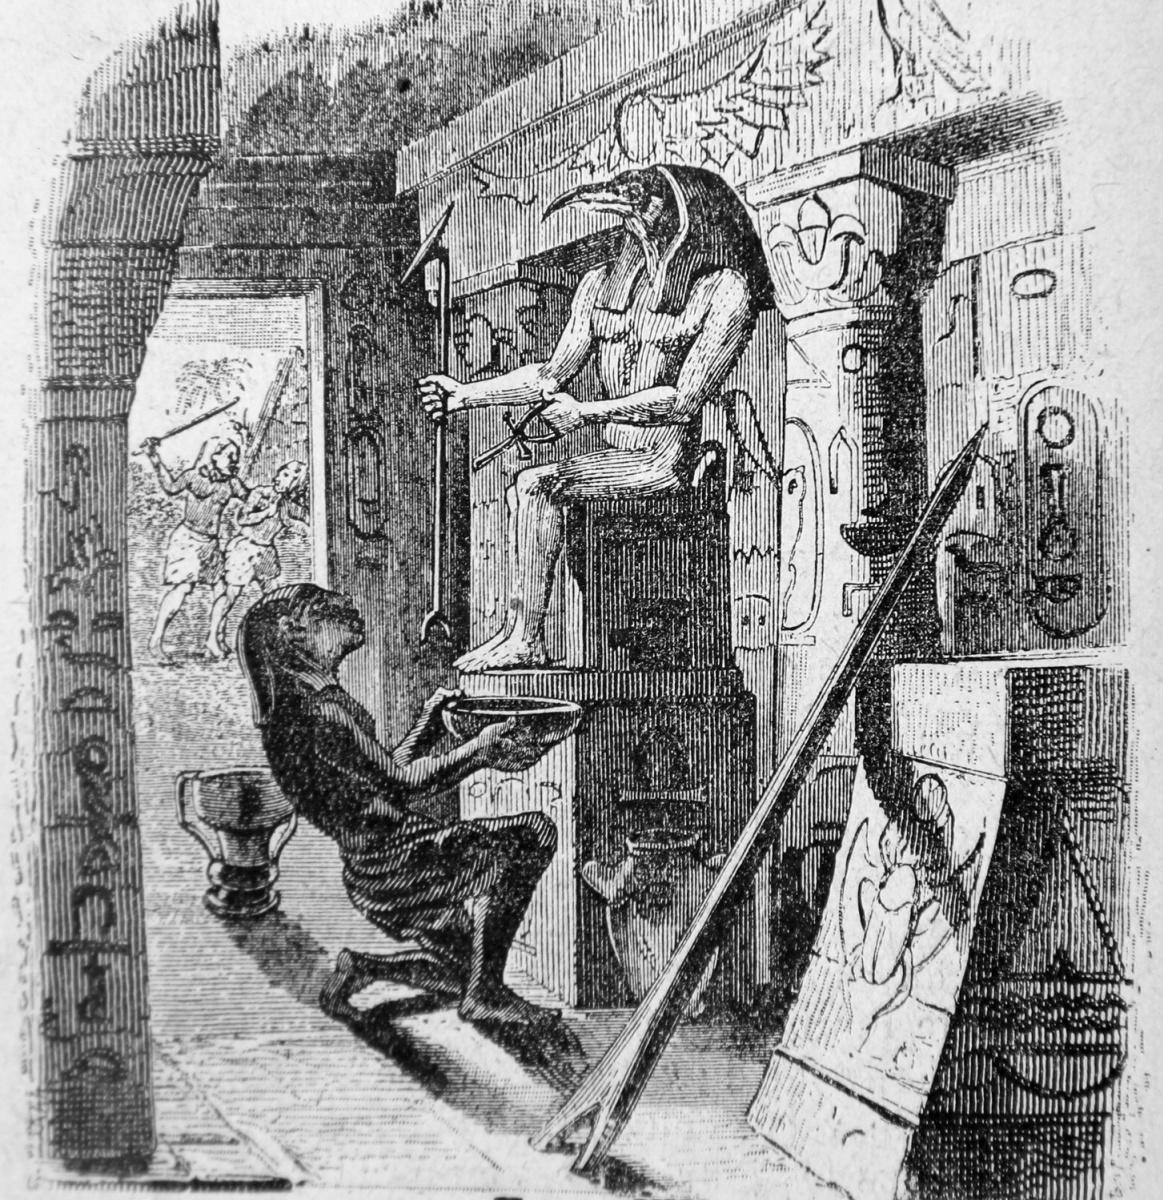 Жан Иньяс Изидор (Жерар) Гранвиль. Язычник и Идол. Иллюстрации к басням Жана де Лафонтена